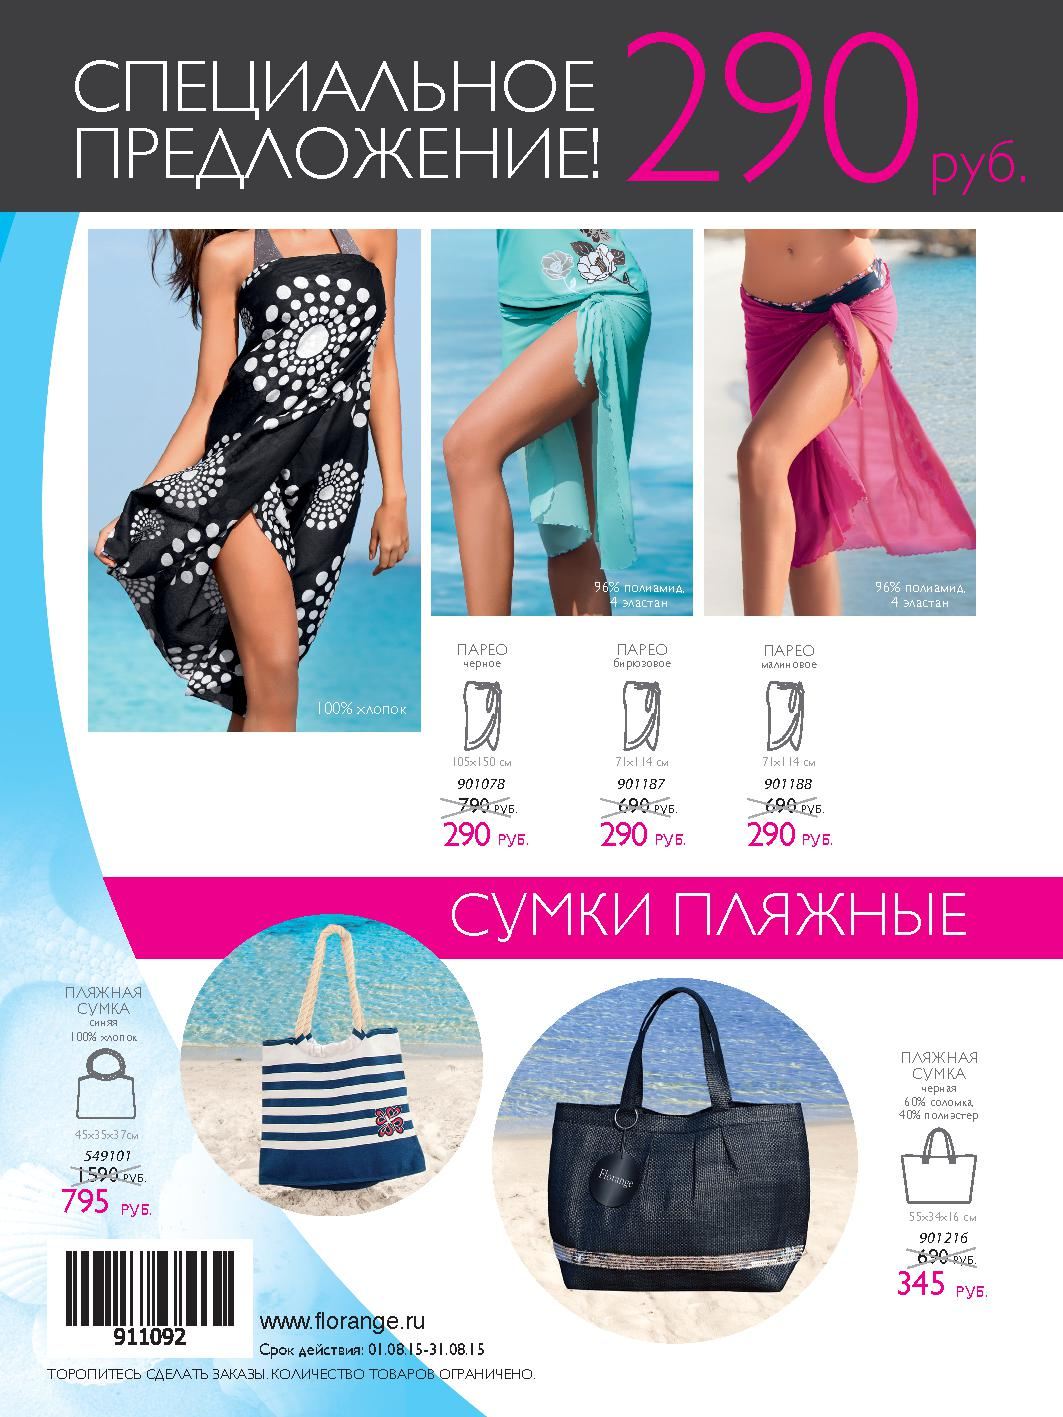 Распродажа Флоранж - пляжная сумка, парео